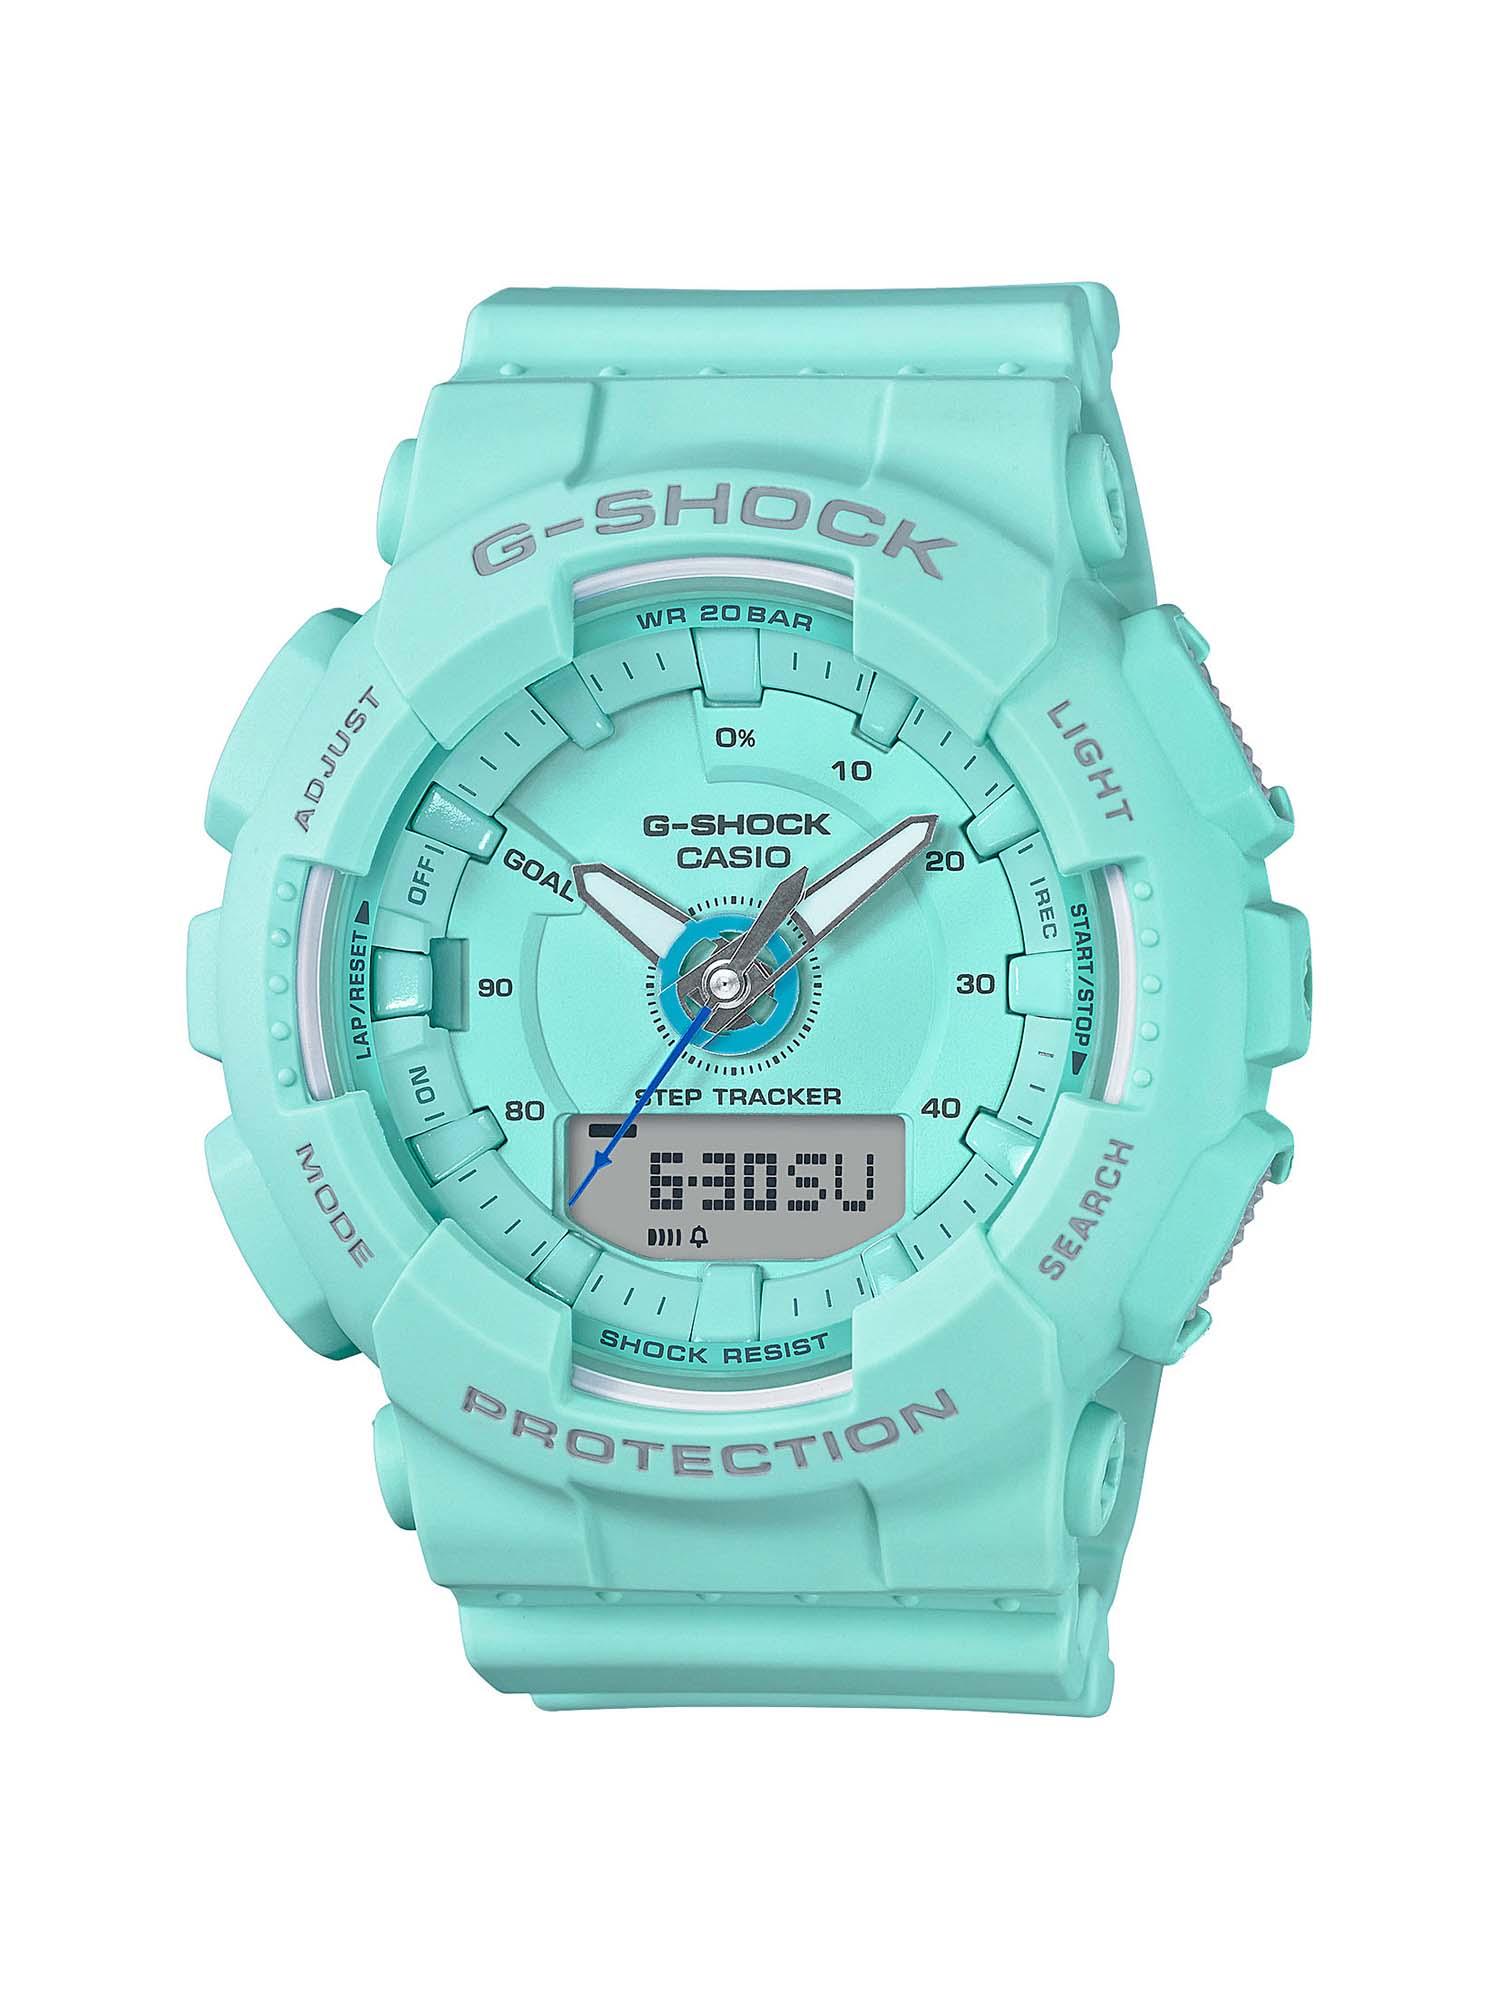 часы g shock casio gma s130 a7 любящим